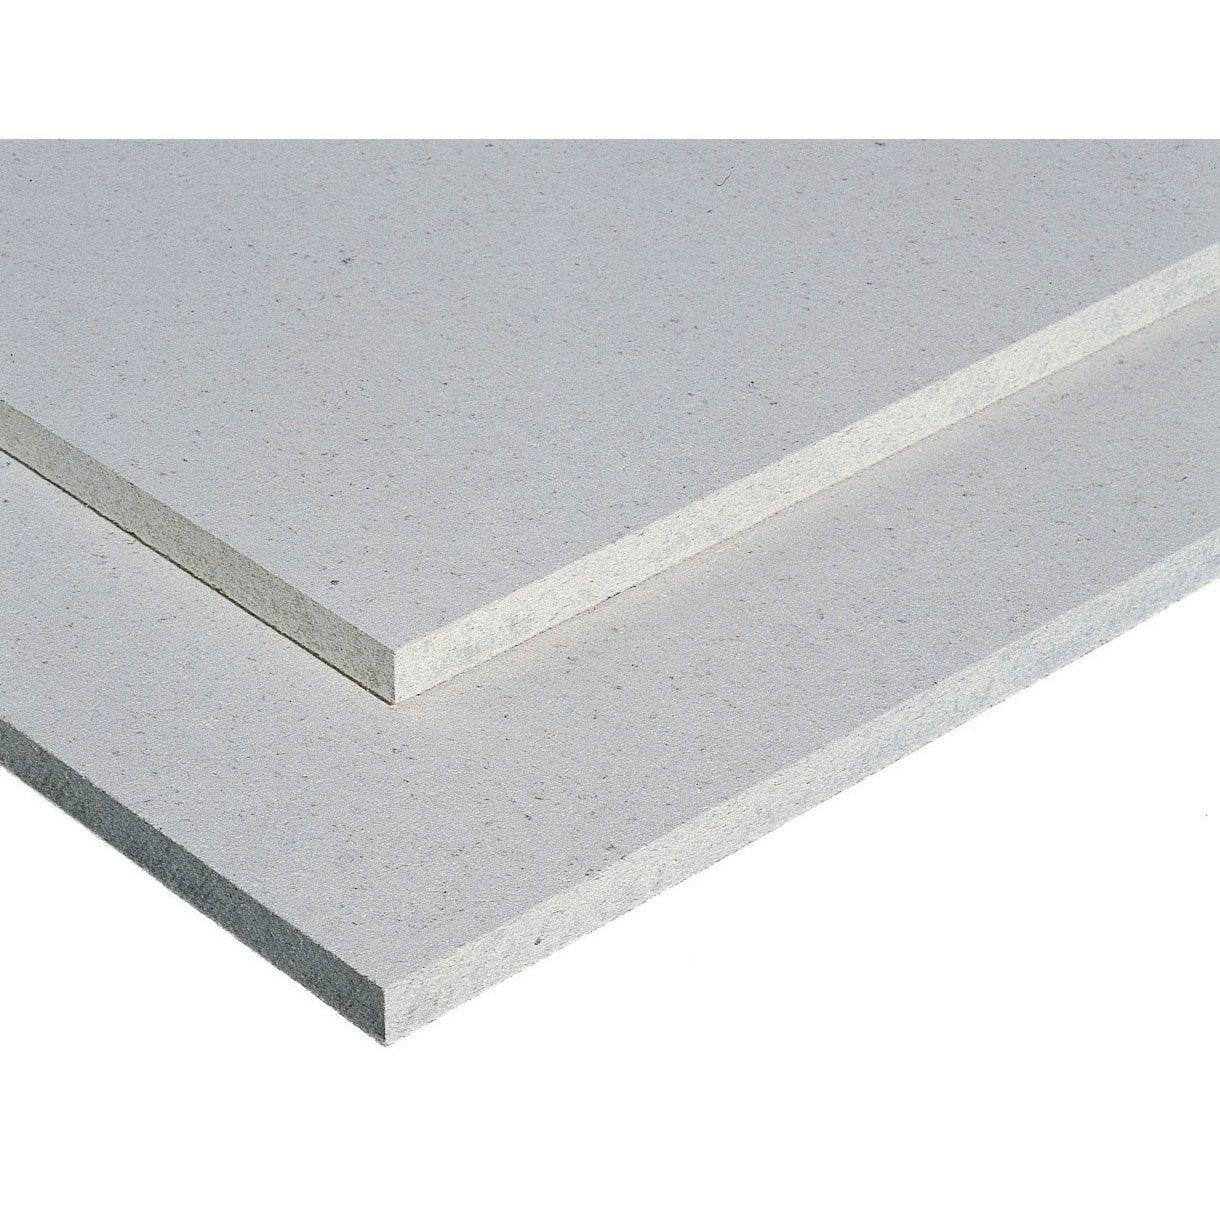 Plaque de sol fermacell m ep 10 10 mm leroy merlin for Sols vinyles leroy merlin